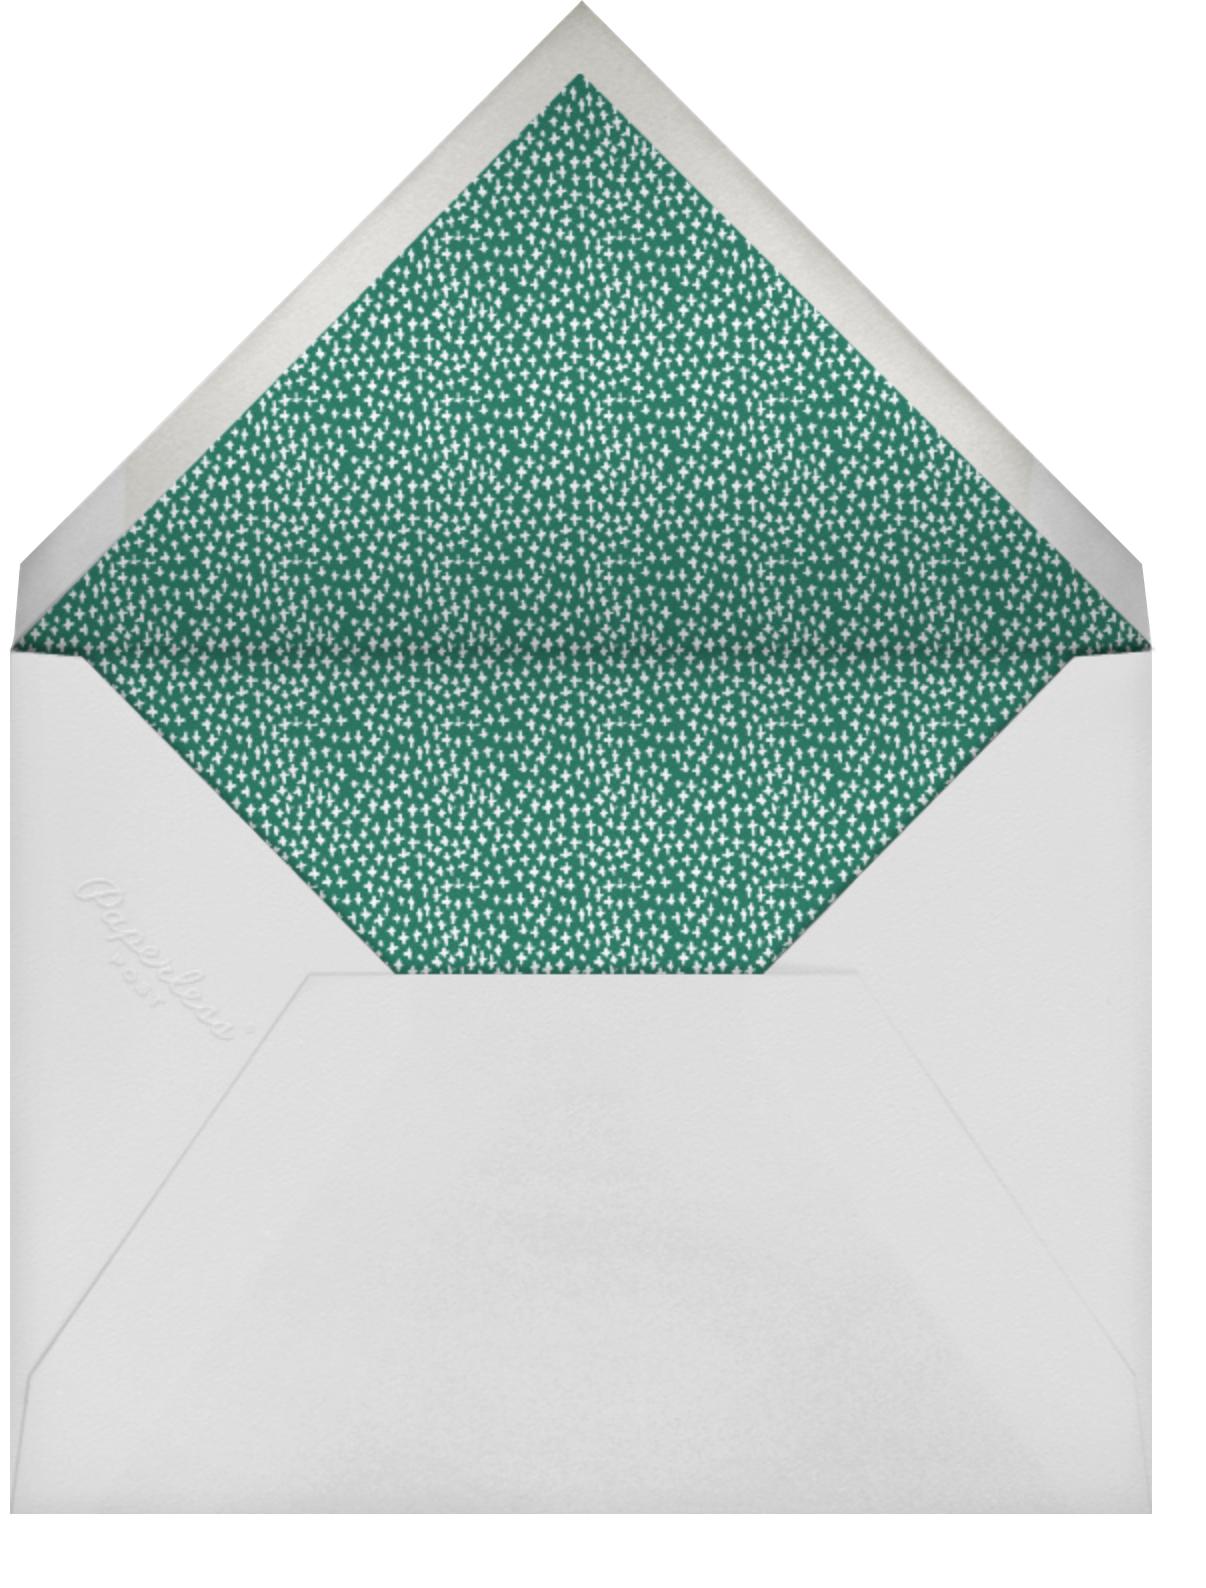 Merry Berries - Mr. Boddington's Studio - Holiday cards - envelope back